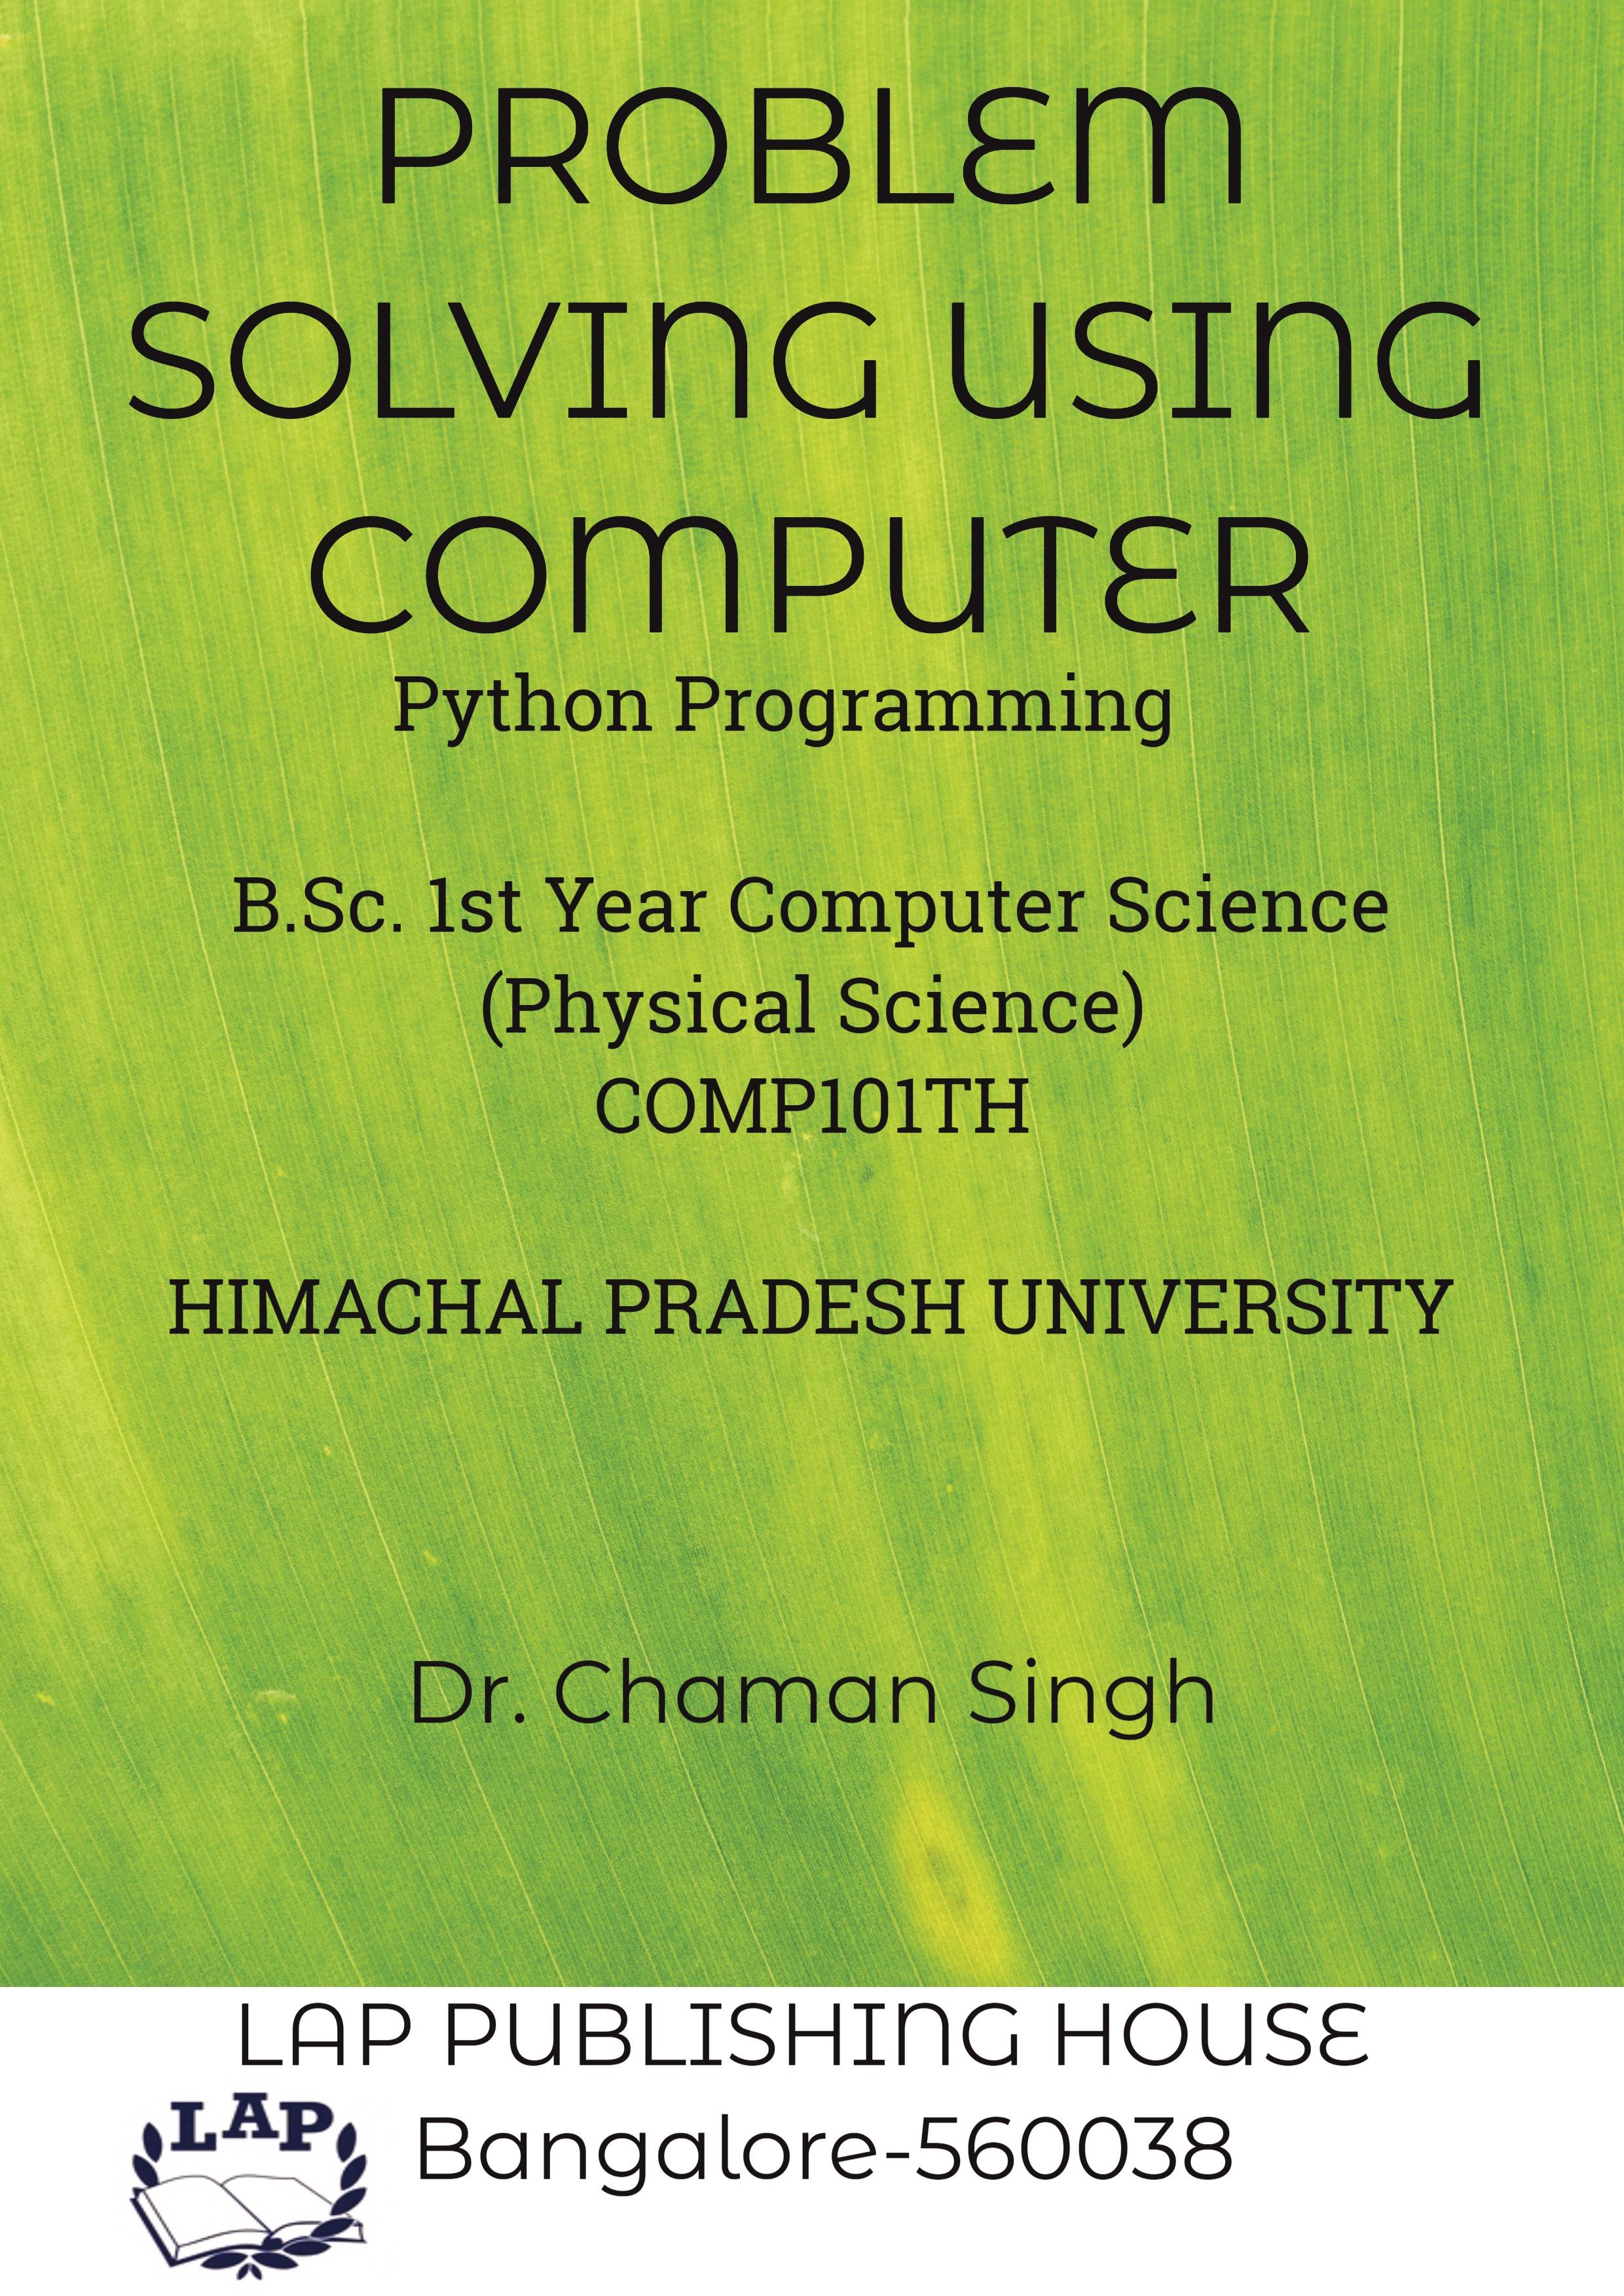 Problem Solving Using Computer | Pothi com